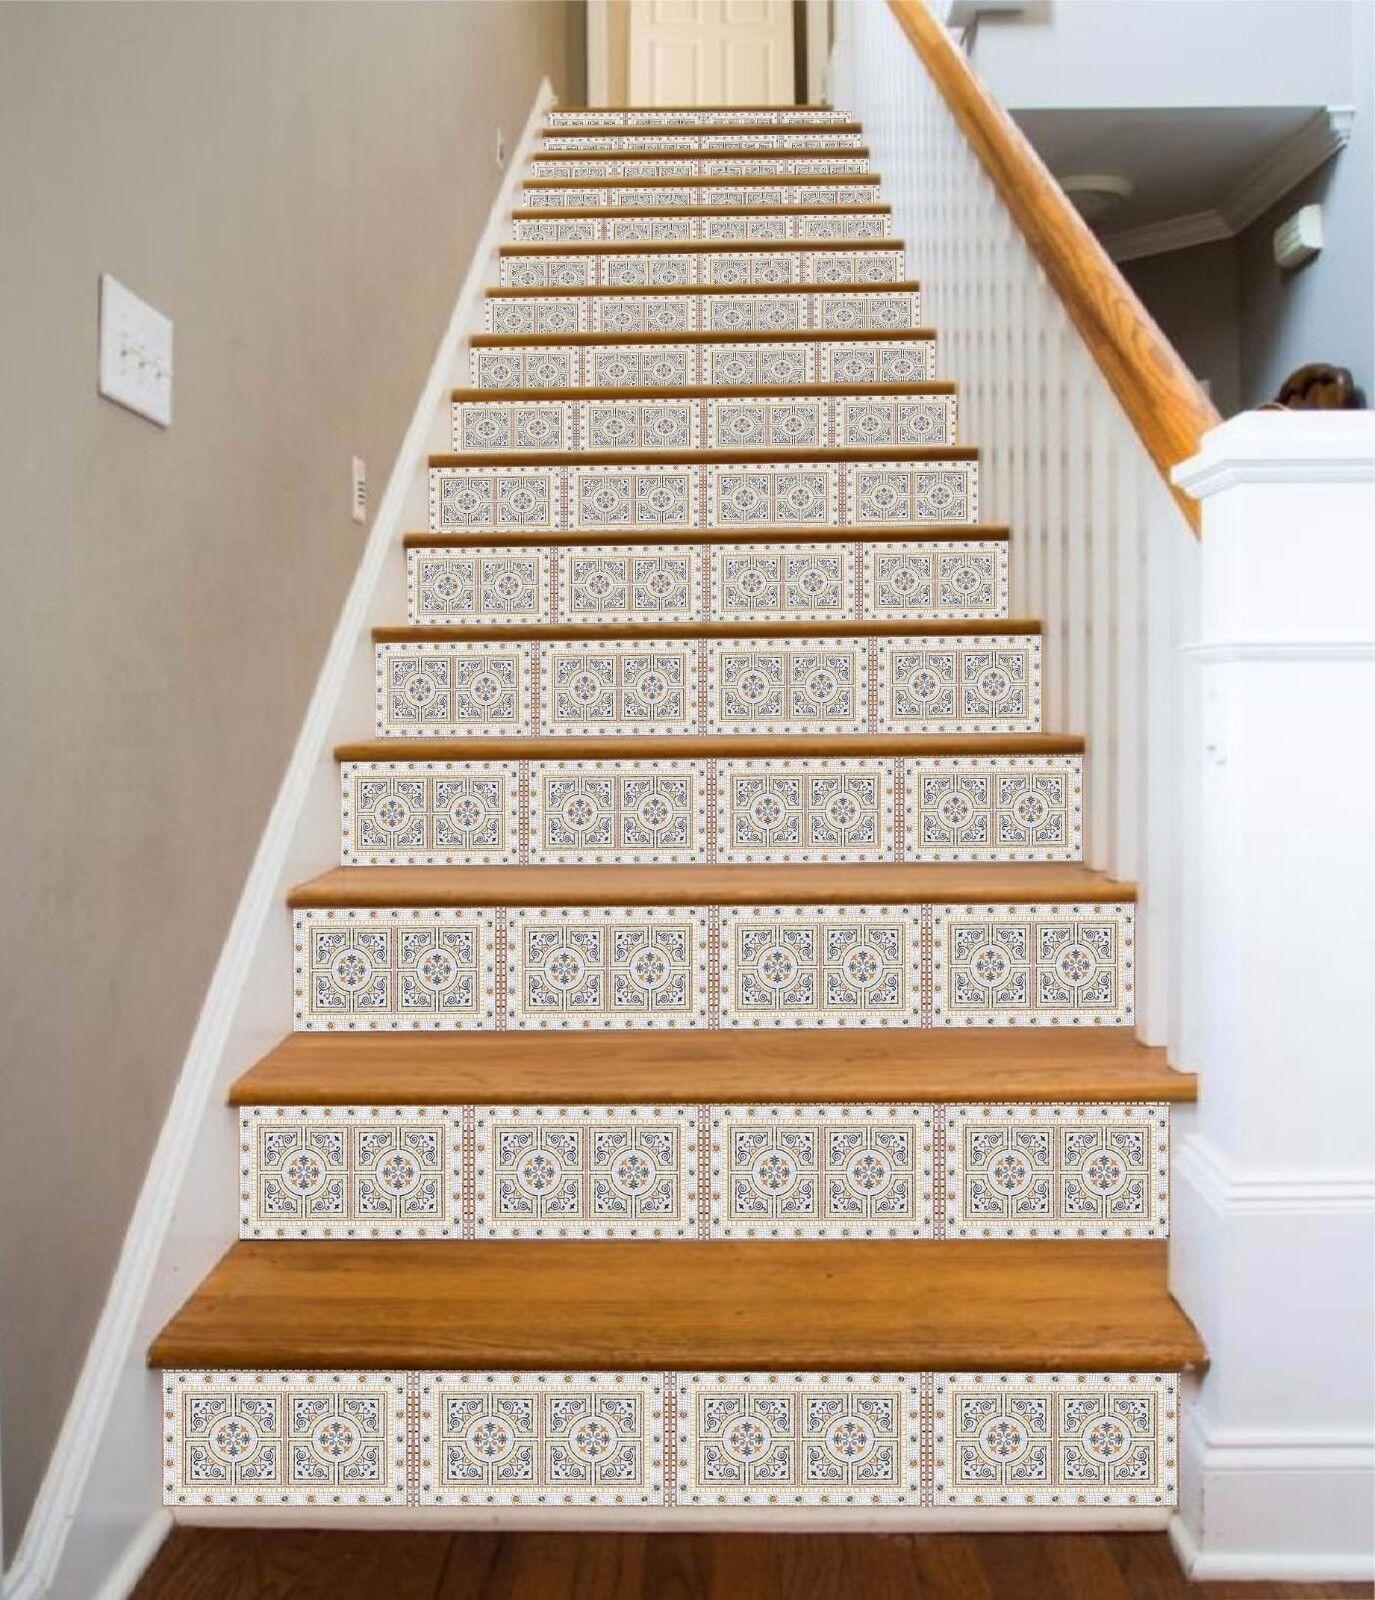 3D Muster 49 Stair Risers Dekoration Fototapete Vinyl Aufkleber Aufkleber Aufkleber Tapete DE Lemon 7187b6